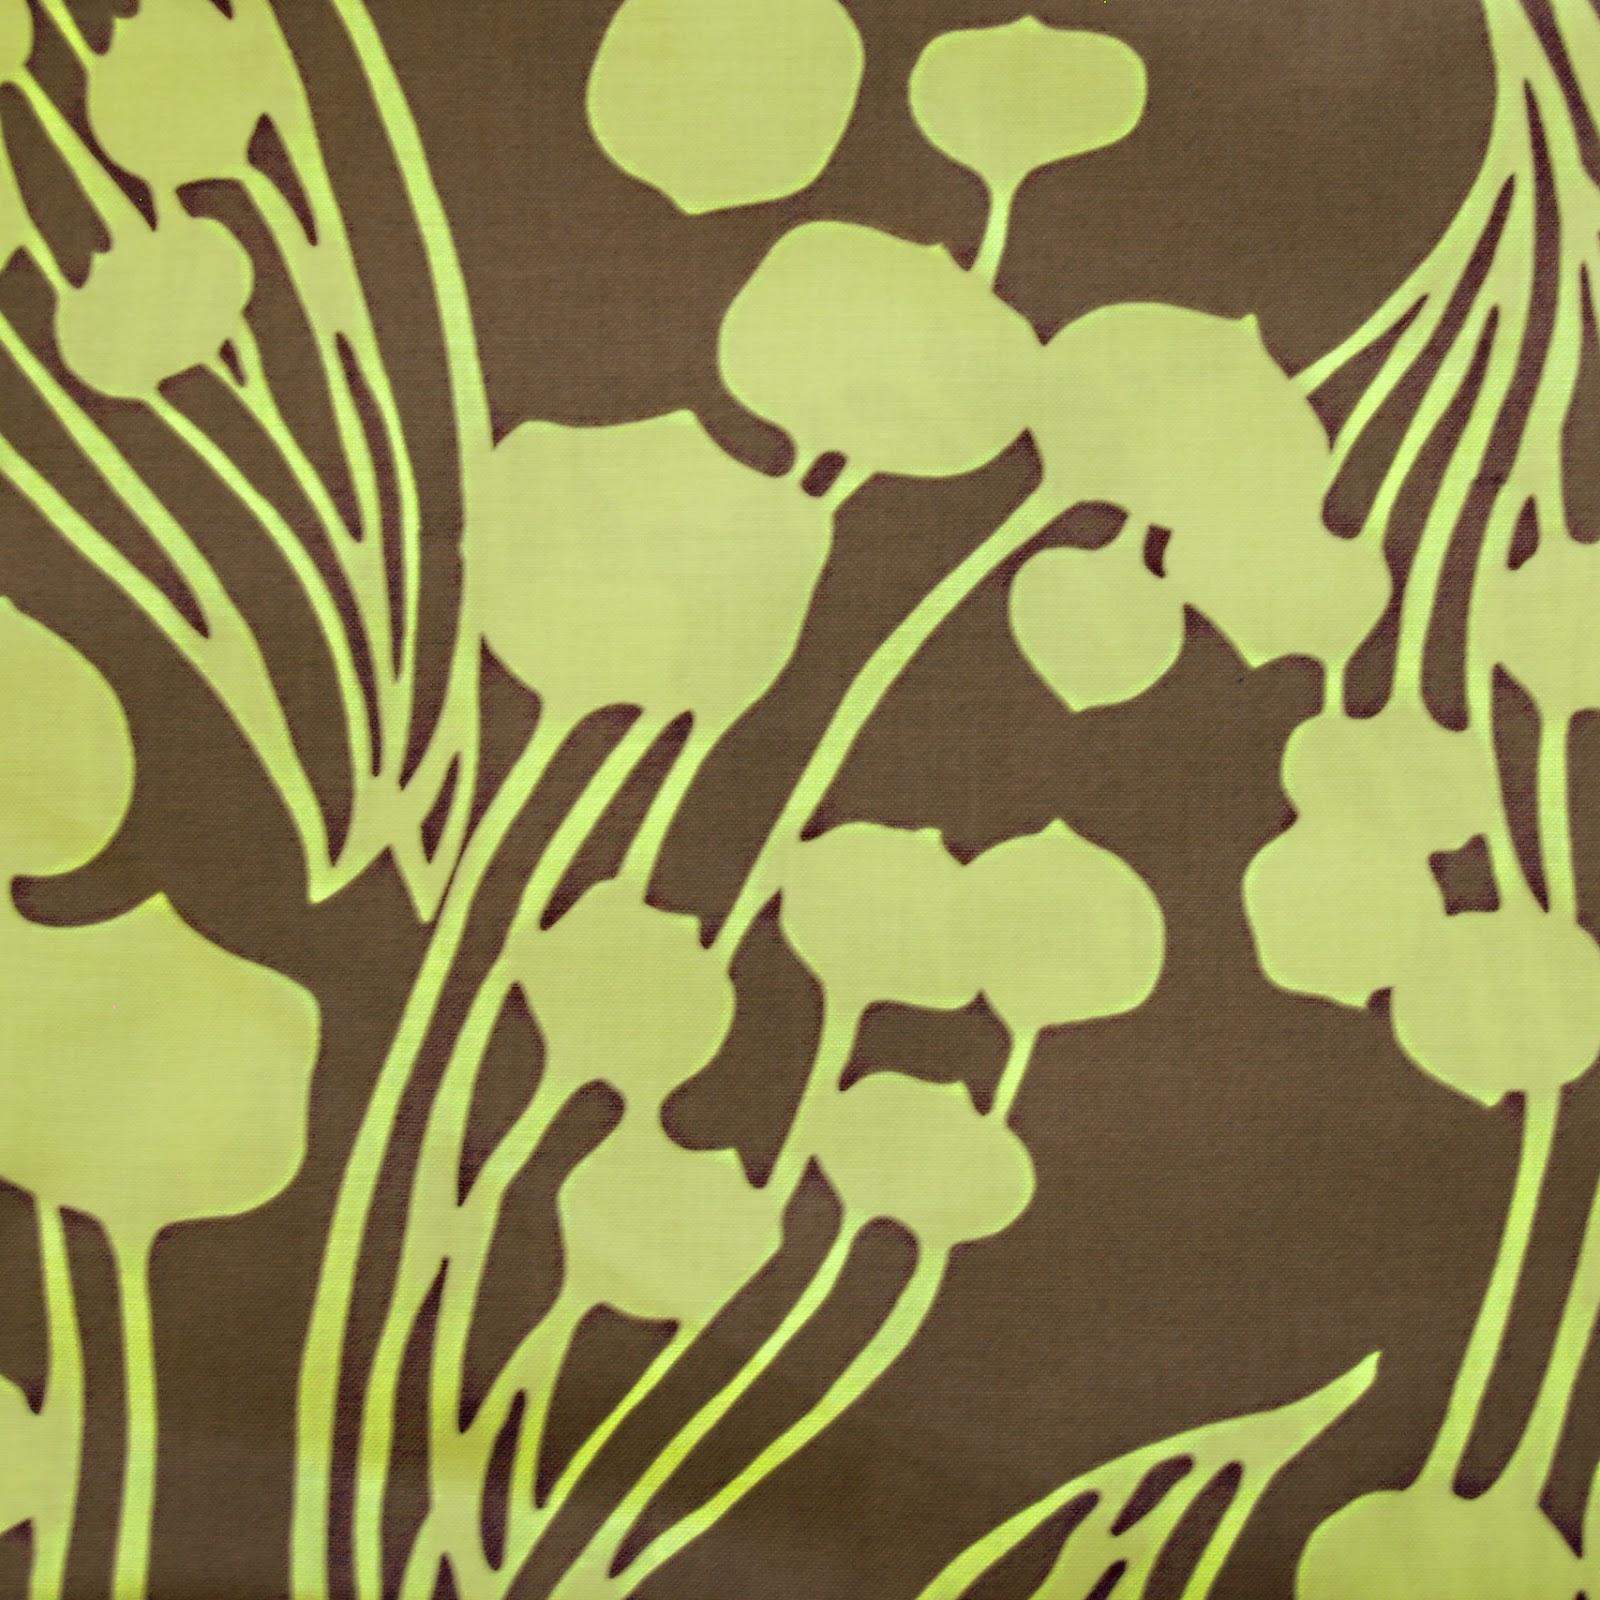 algodon ecologico, telas 2014, bolsos